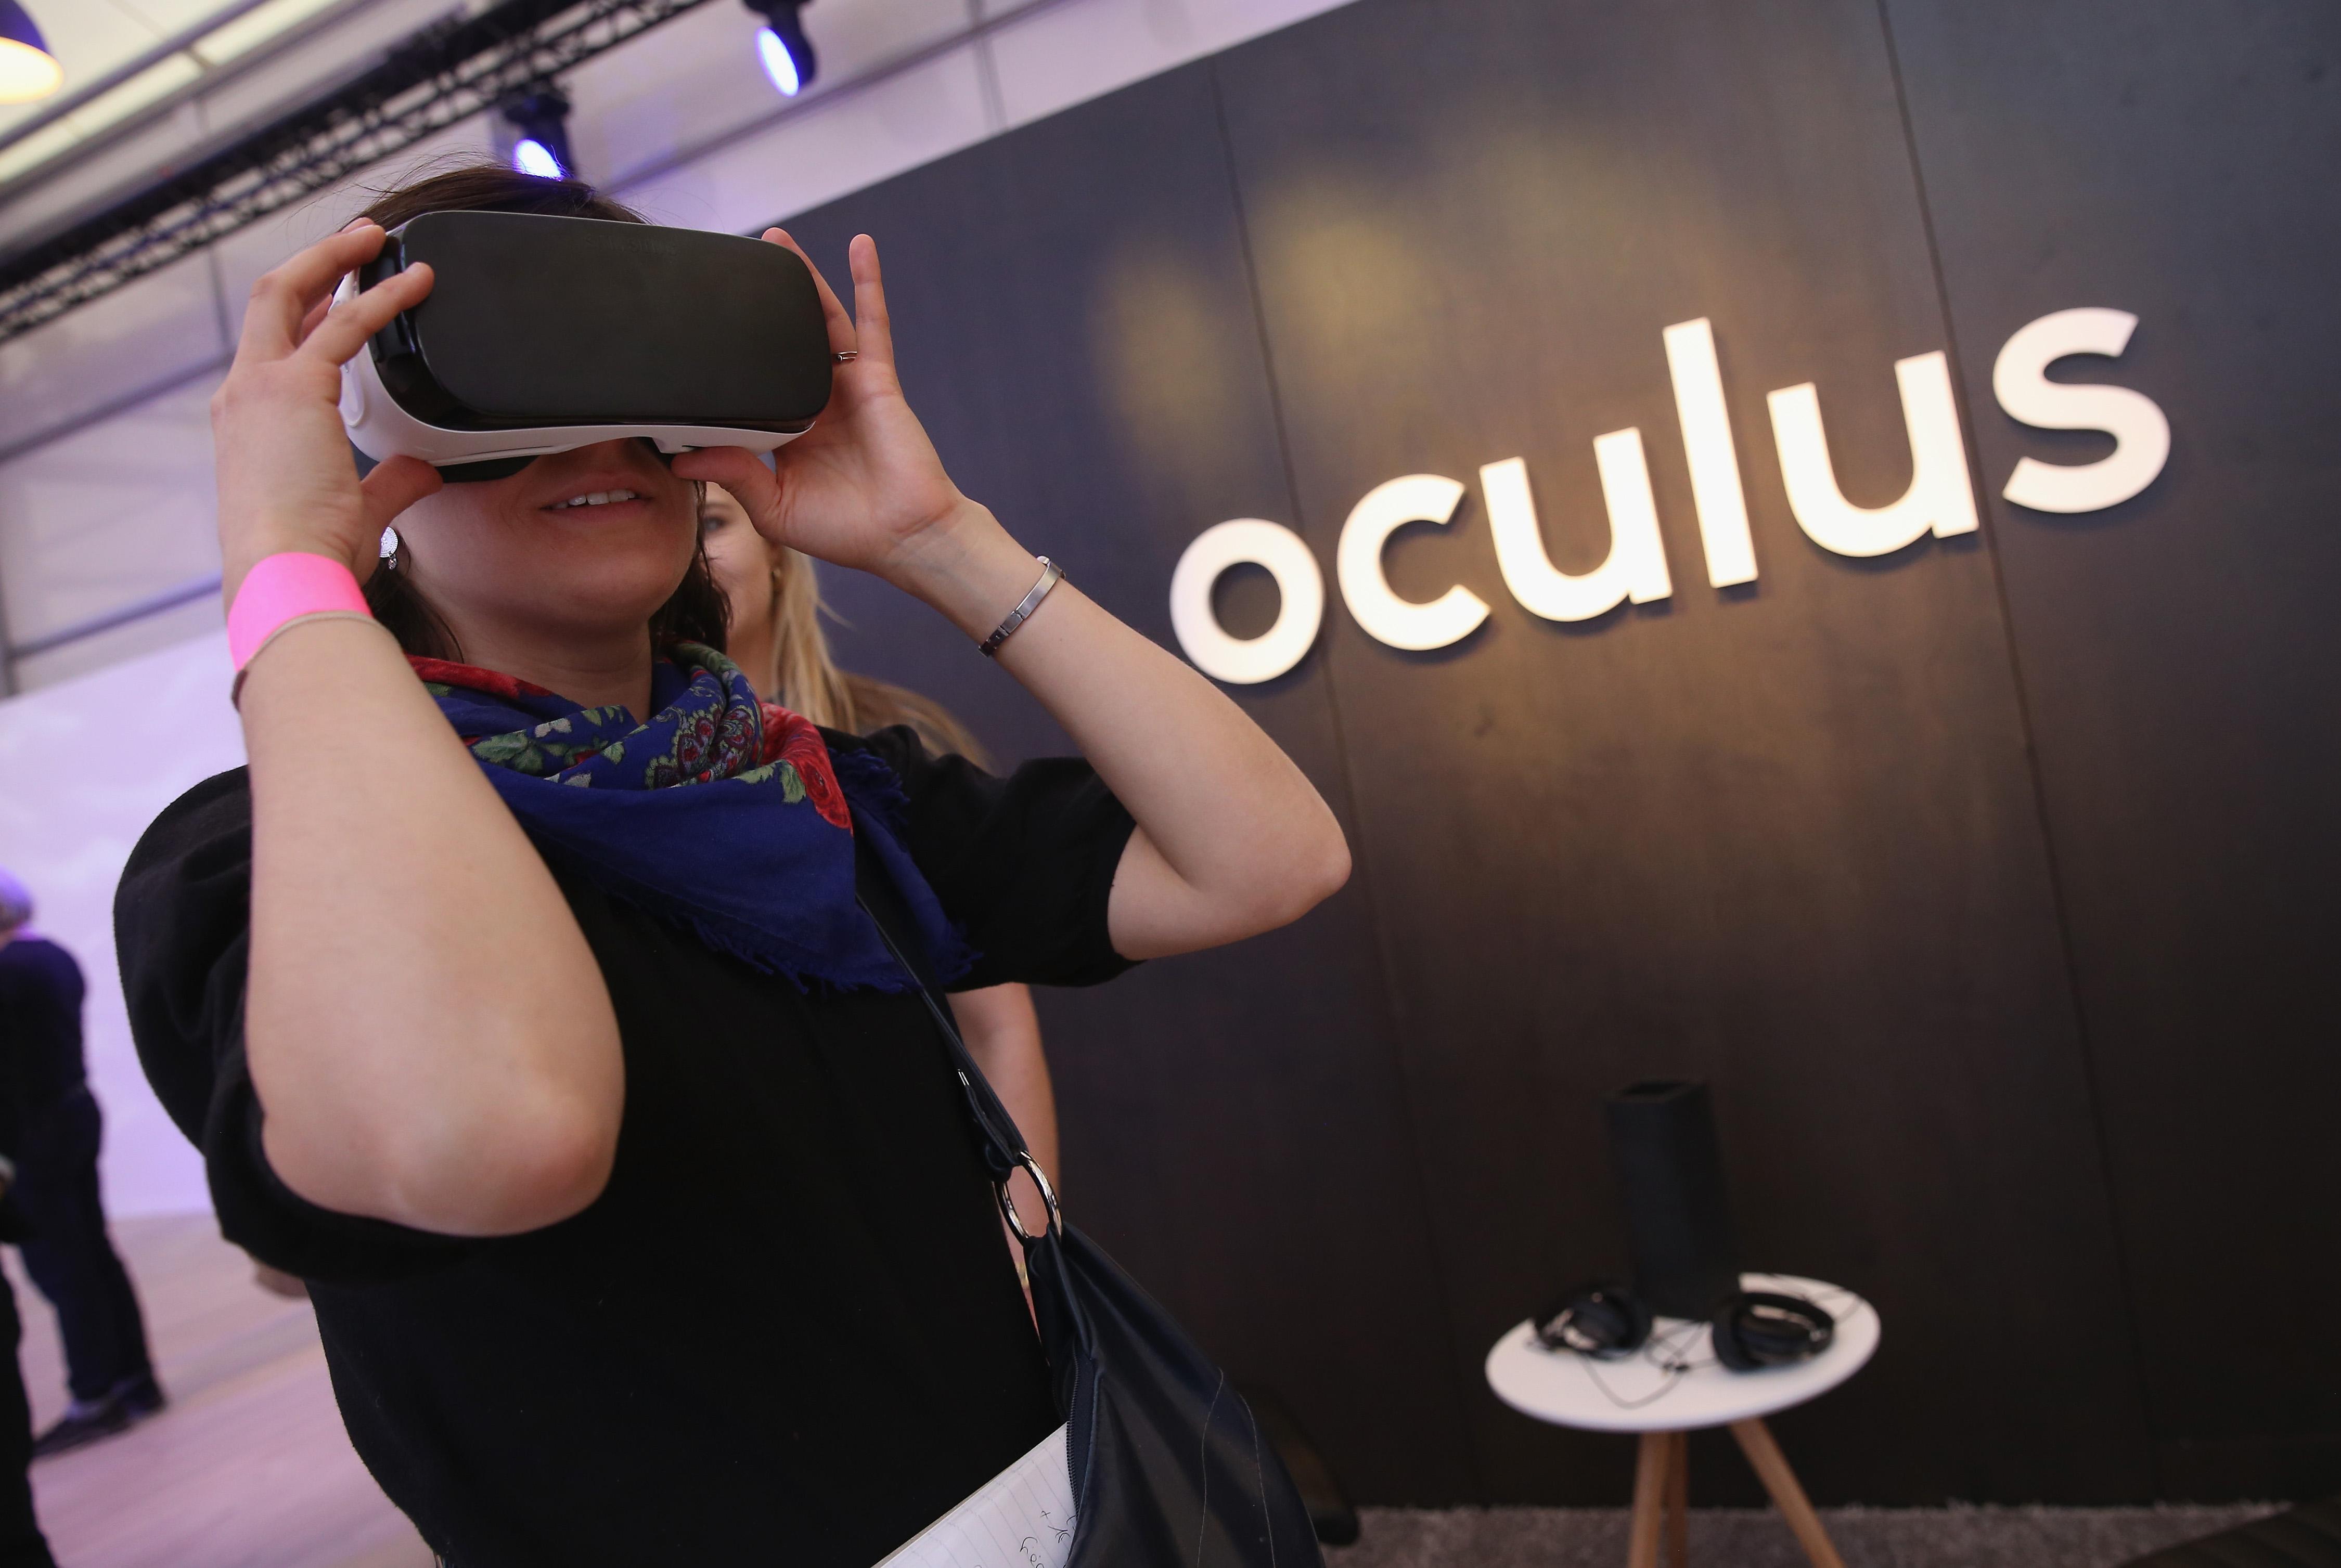 Facebook Exhibits Technologies At Innovation Hub